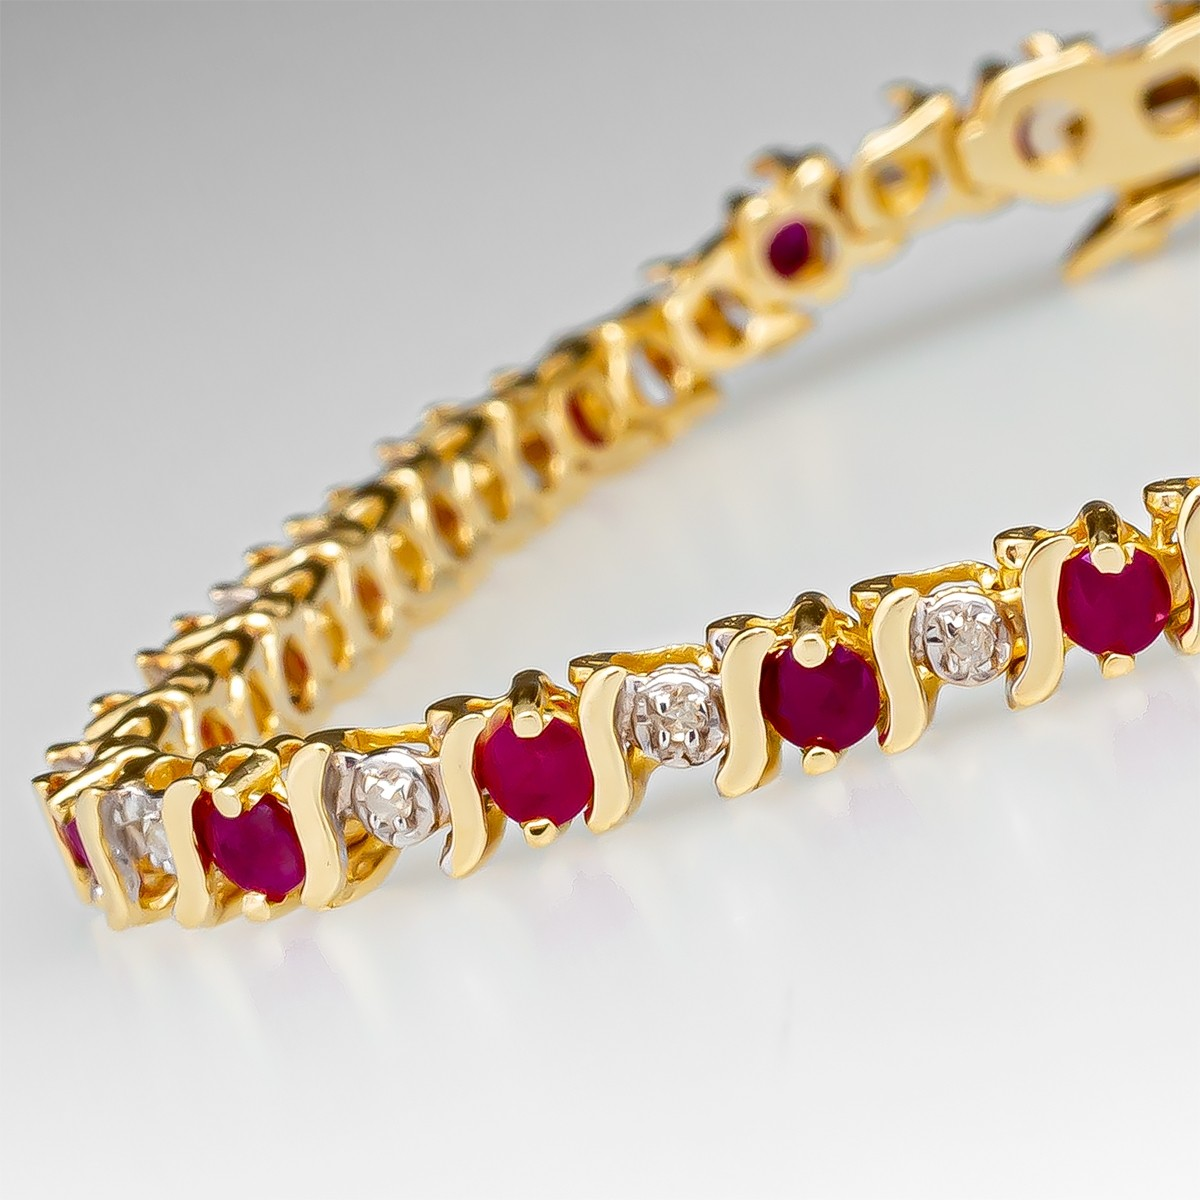 Details about  /14K Yellow Gold Filled Amethyst Diamond S-Link Tennis Bracelet